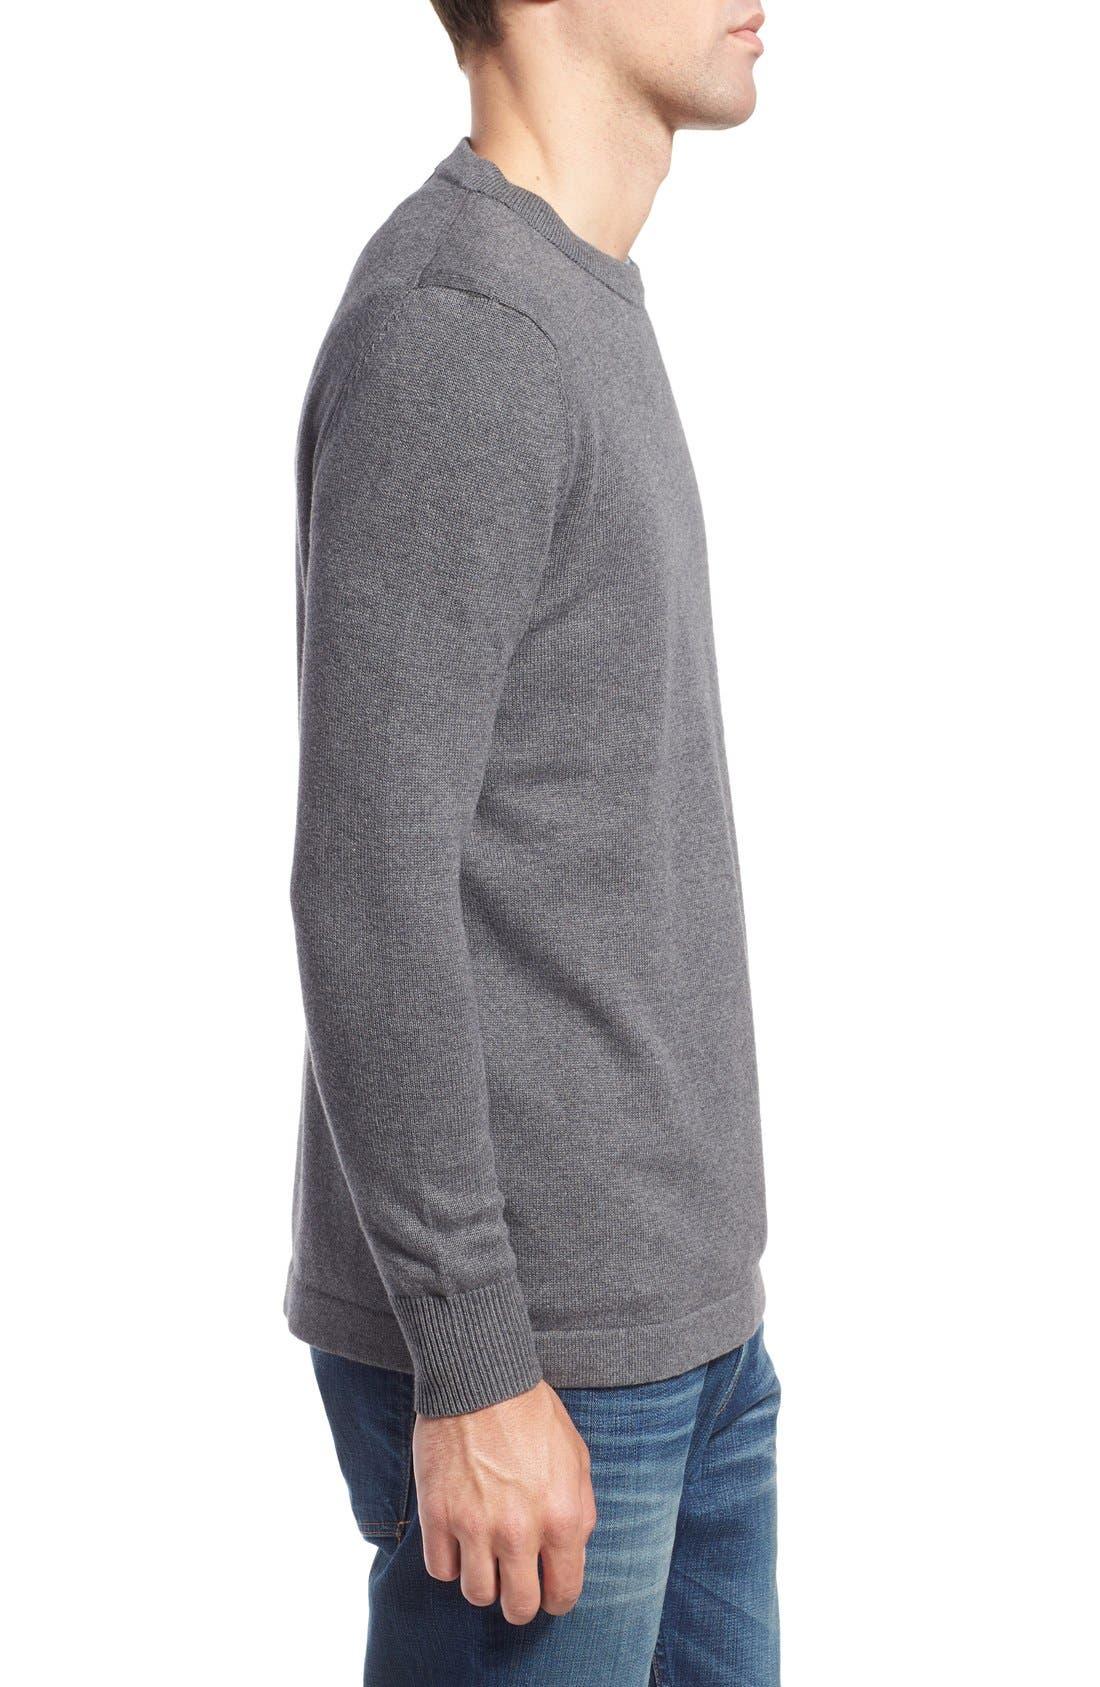 'San Francisco' Crewneck Sweater,                             Alternate thumbnail 3, color,                             Ash